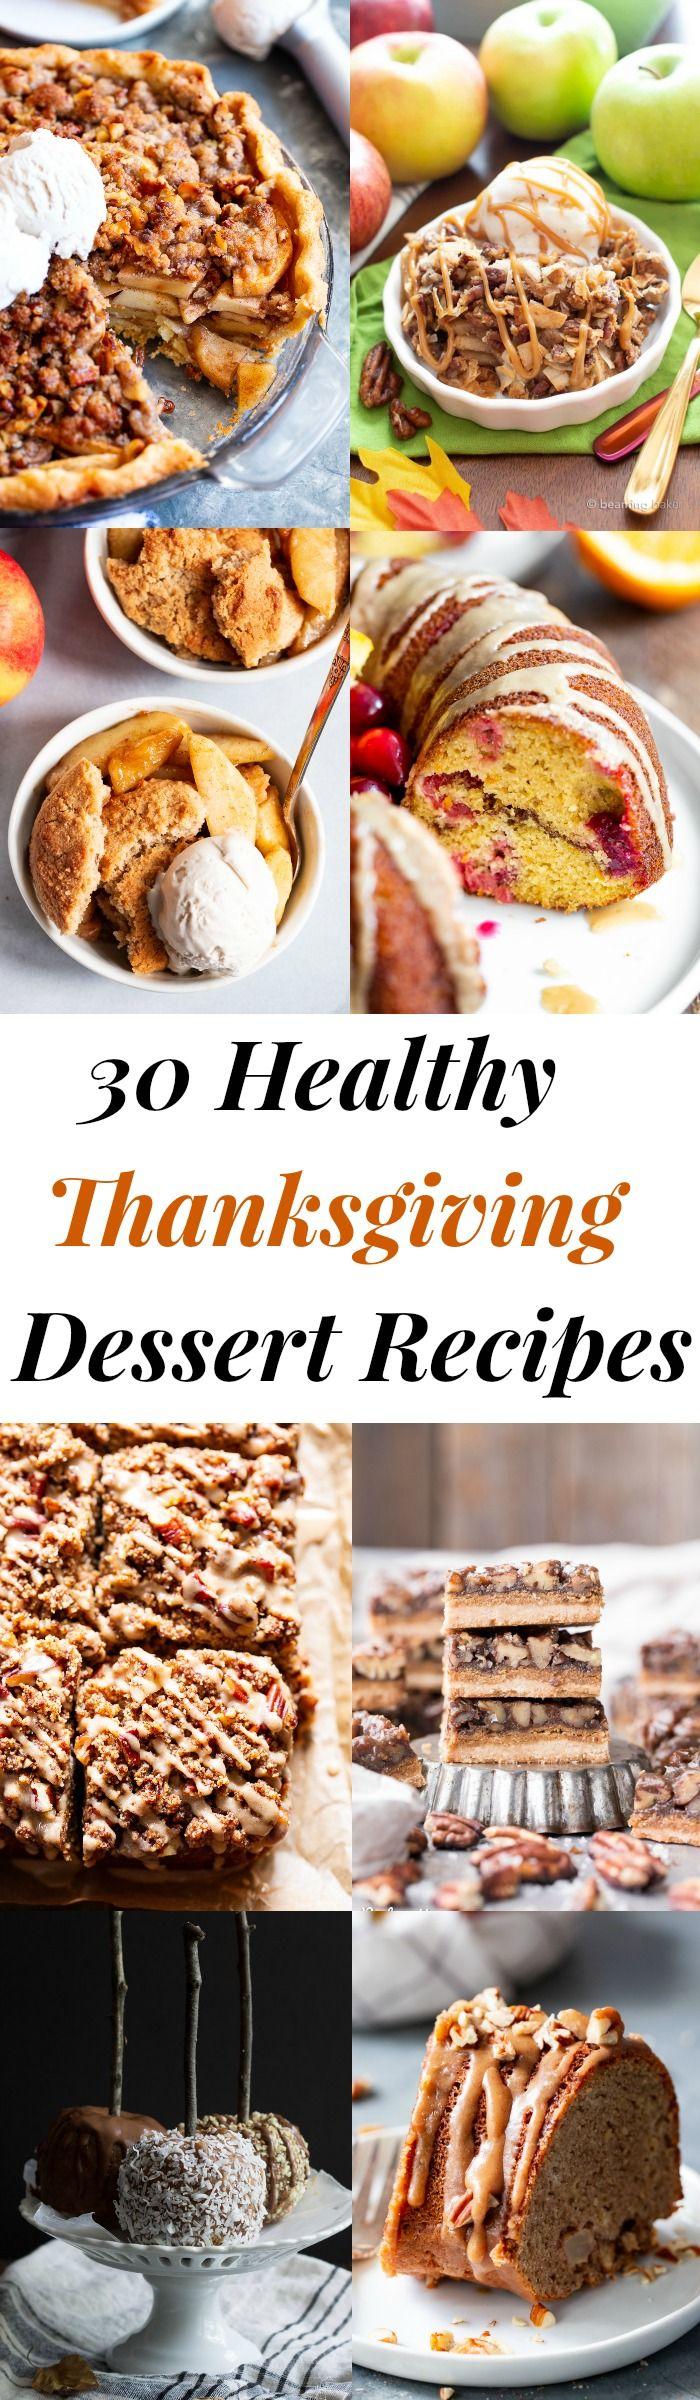 30 Healthy Thanksgiving Dessert Recipes Gluten Free Paleo Healthy Thanksgiving Desserts Thanksgiving Food Desserts Gluten Free Desserts Thanksgiving